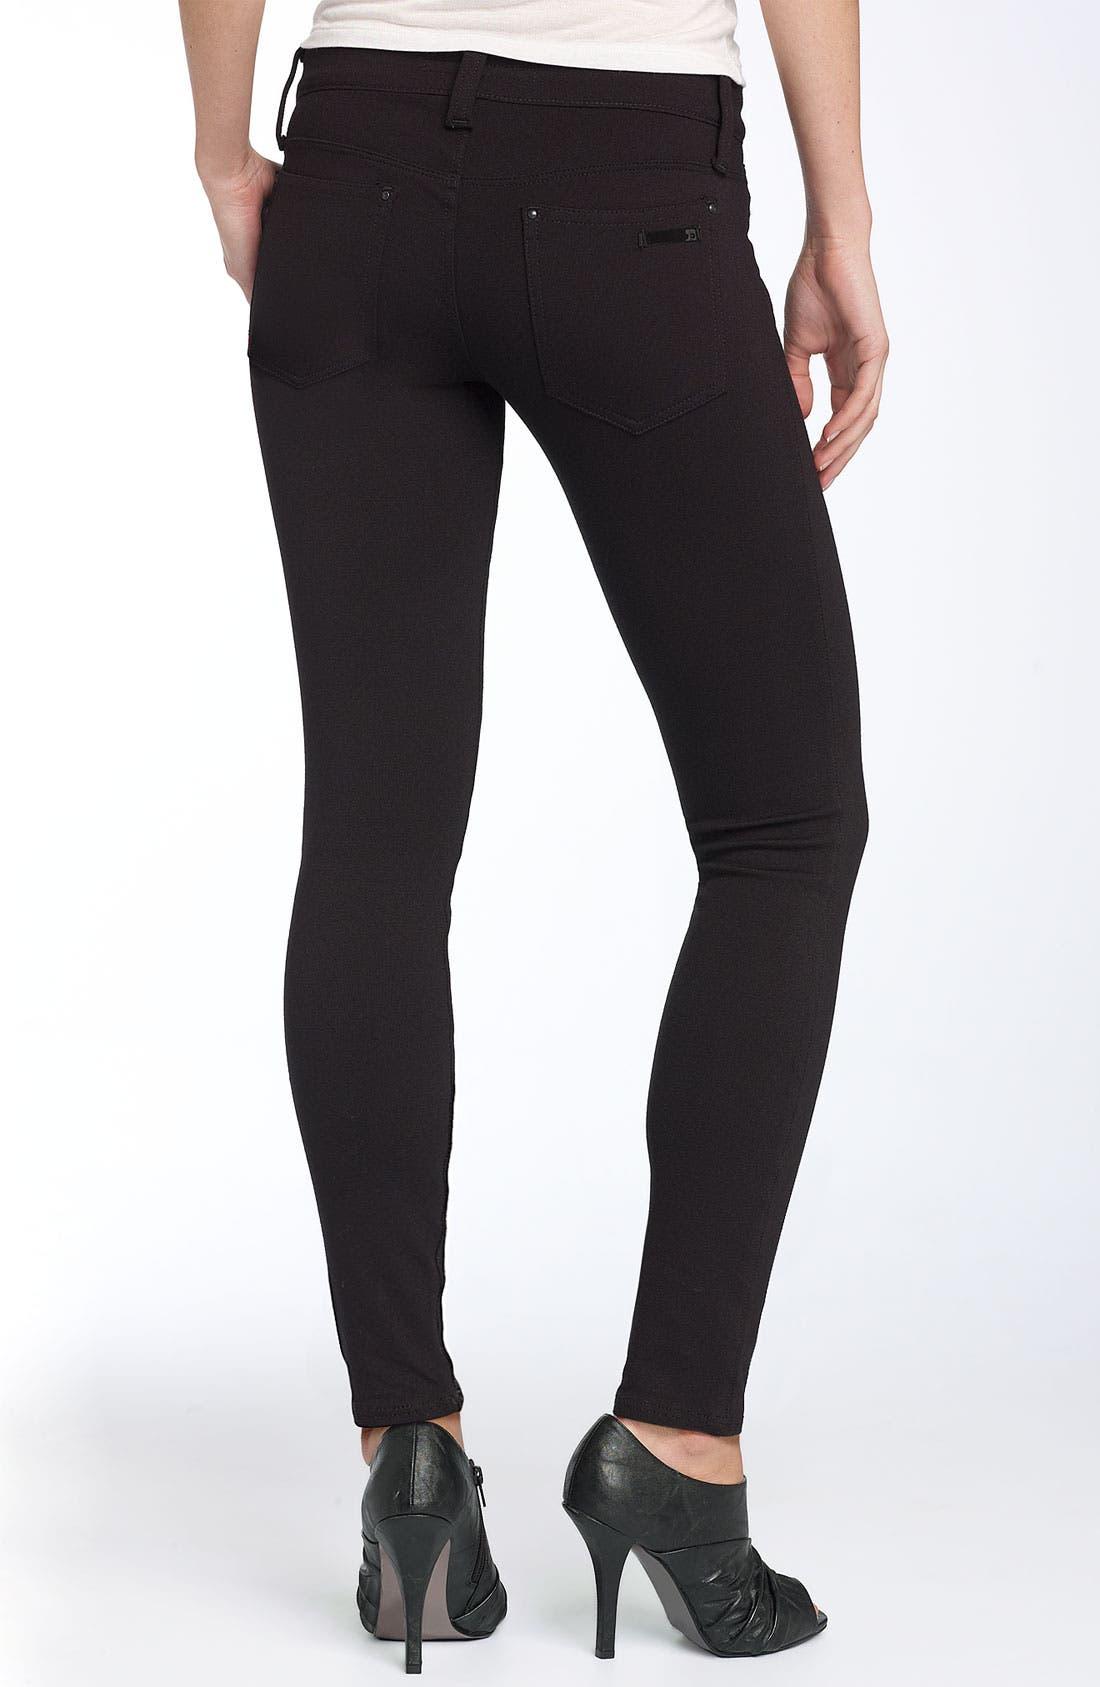 Alternate Image 1 Selected - Joe's Ponte Knit Skinny Leg Pants